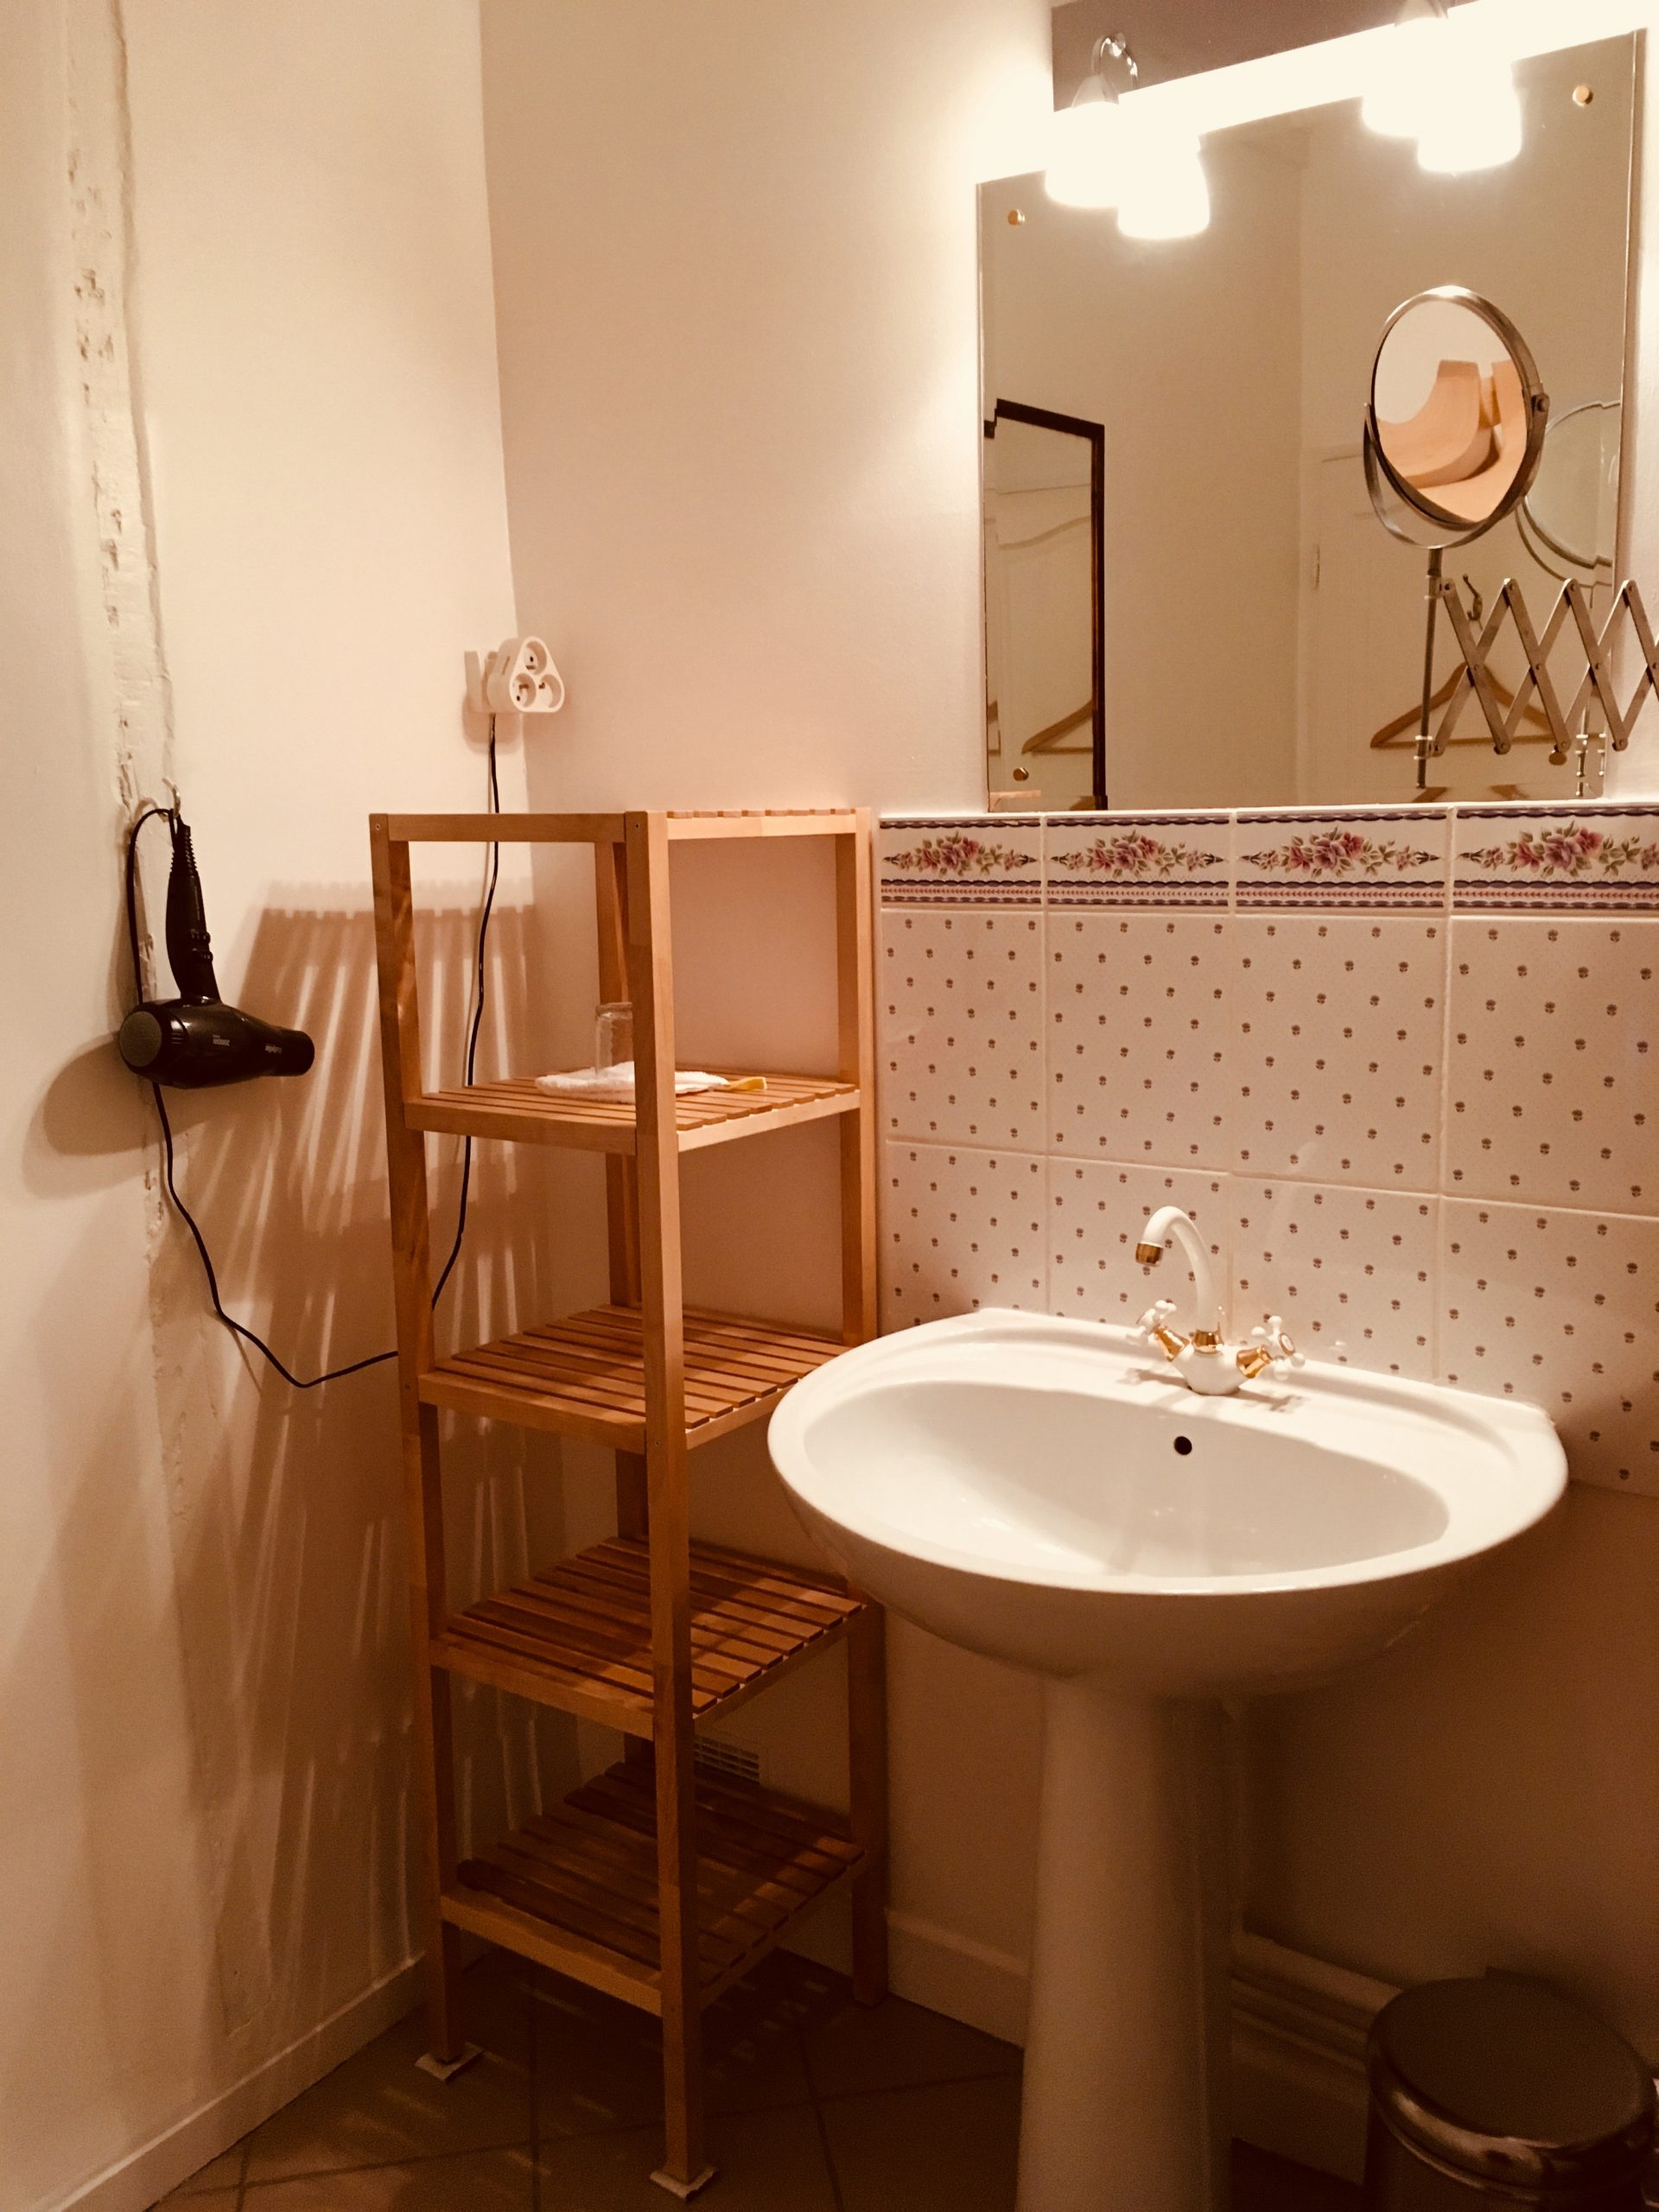 Appartement 4, salle de bain